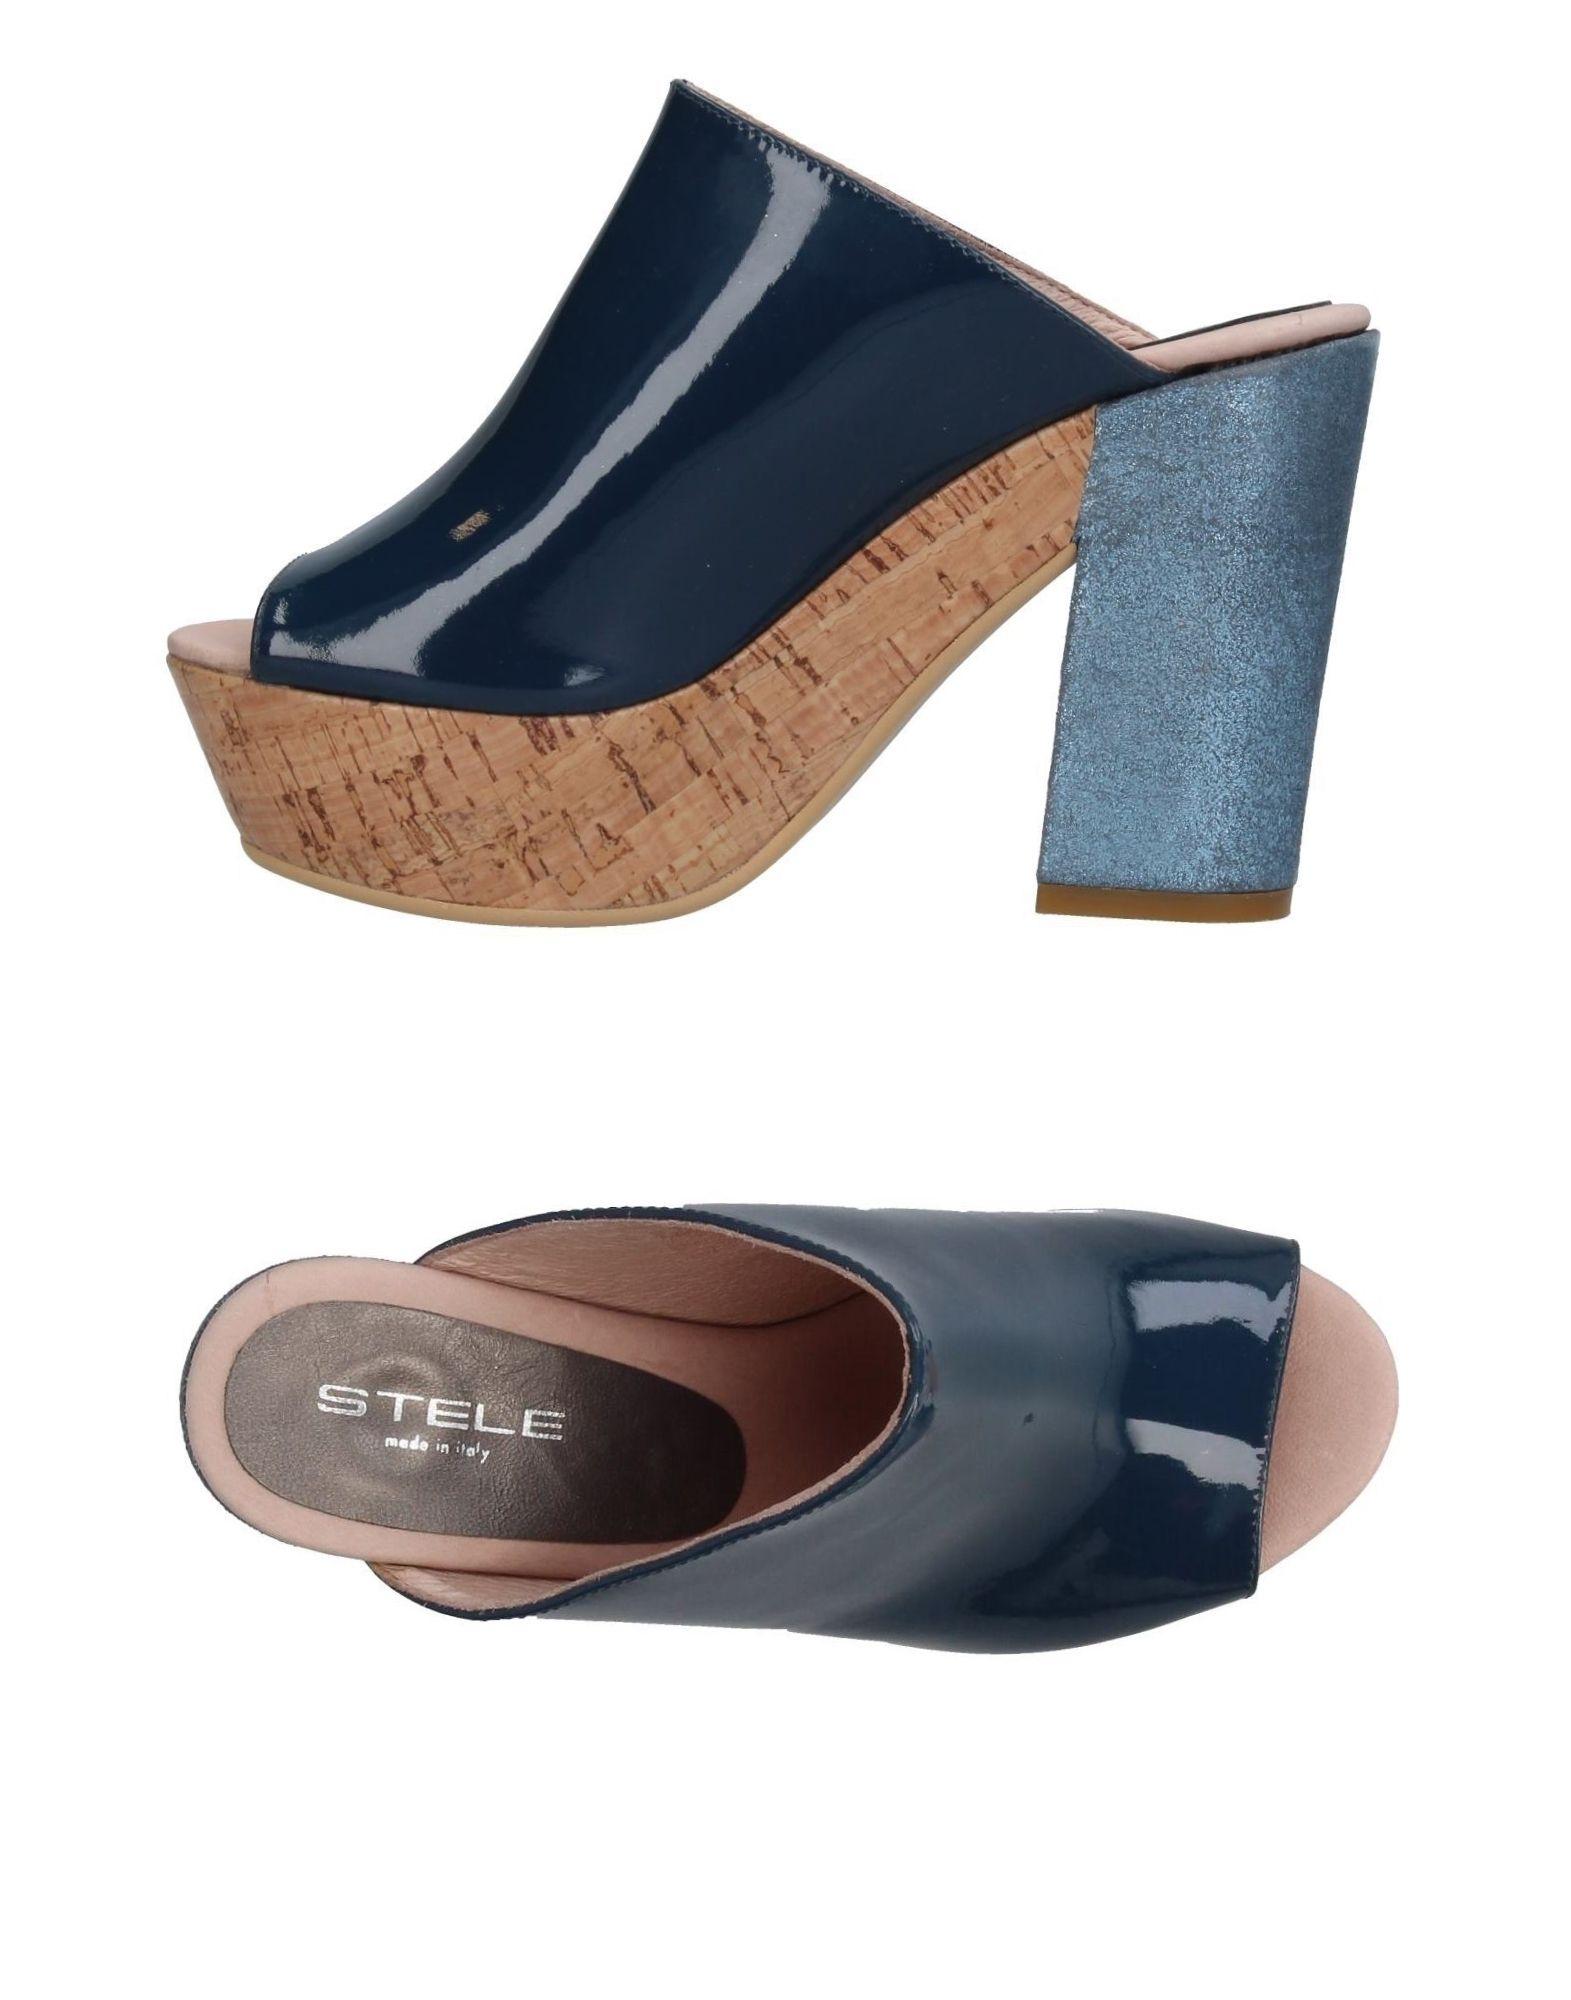 Stele Sandalen Damen  11376590FQ Gute Qualität beliebte Schuhe